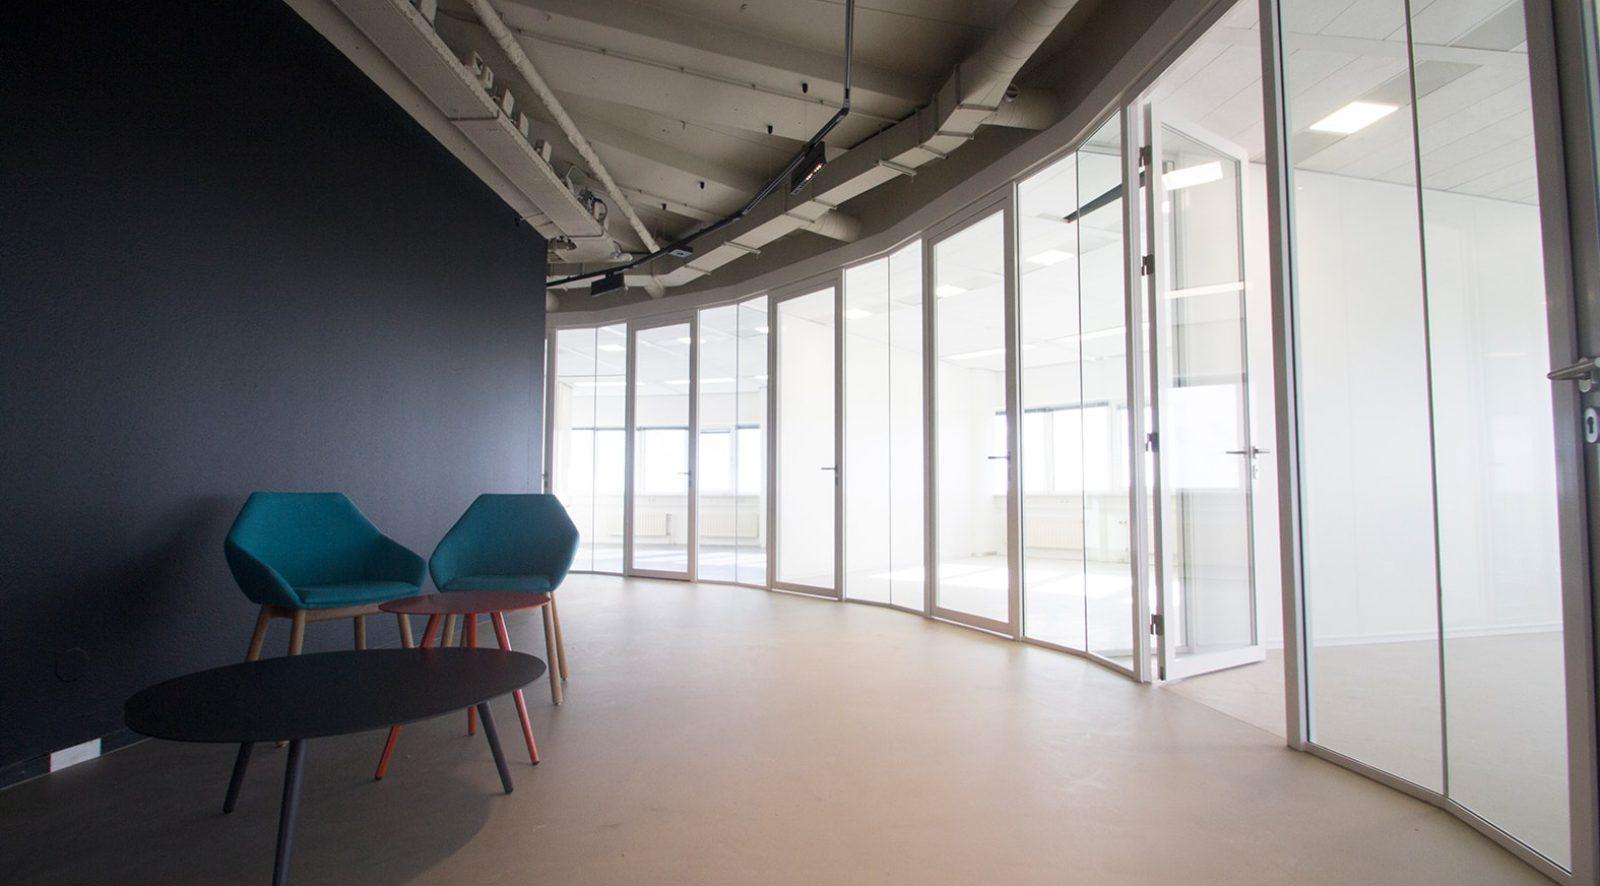 Kantoorruimte | Crown Business Center Zoetermeer